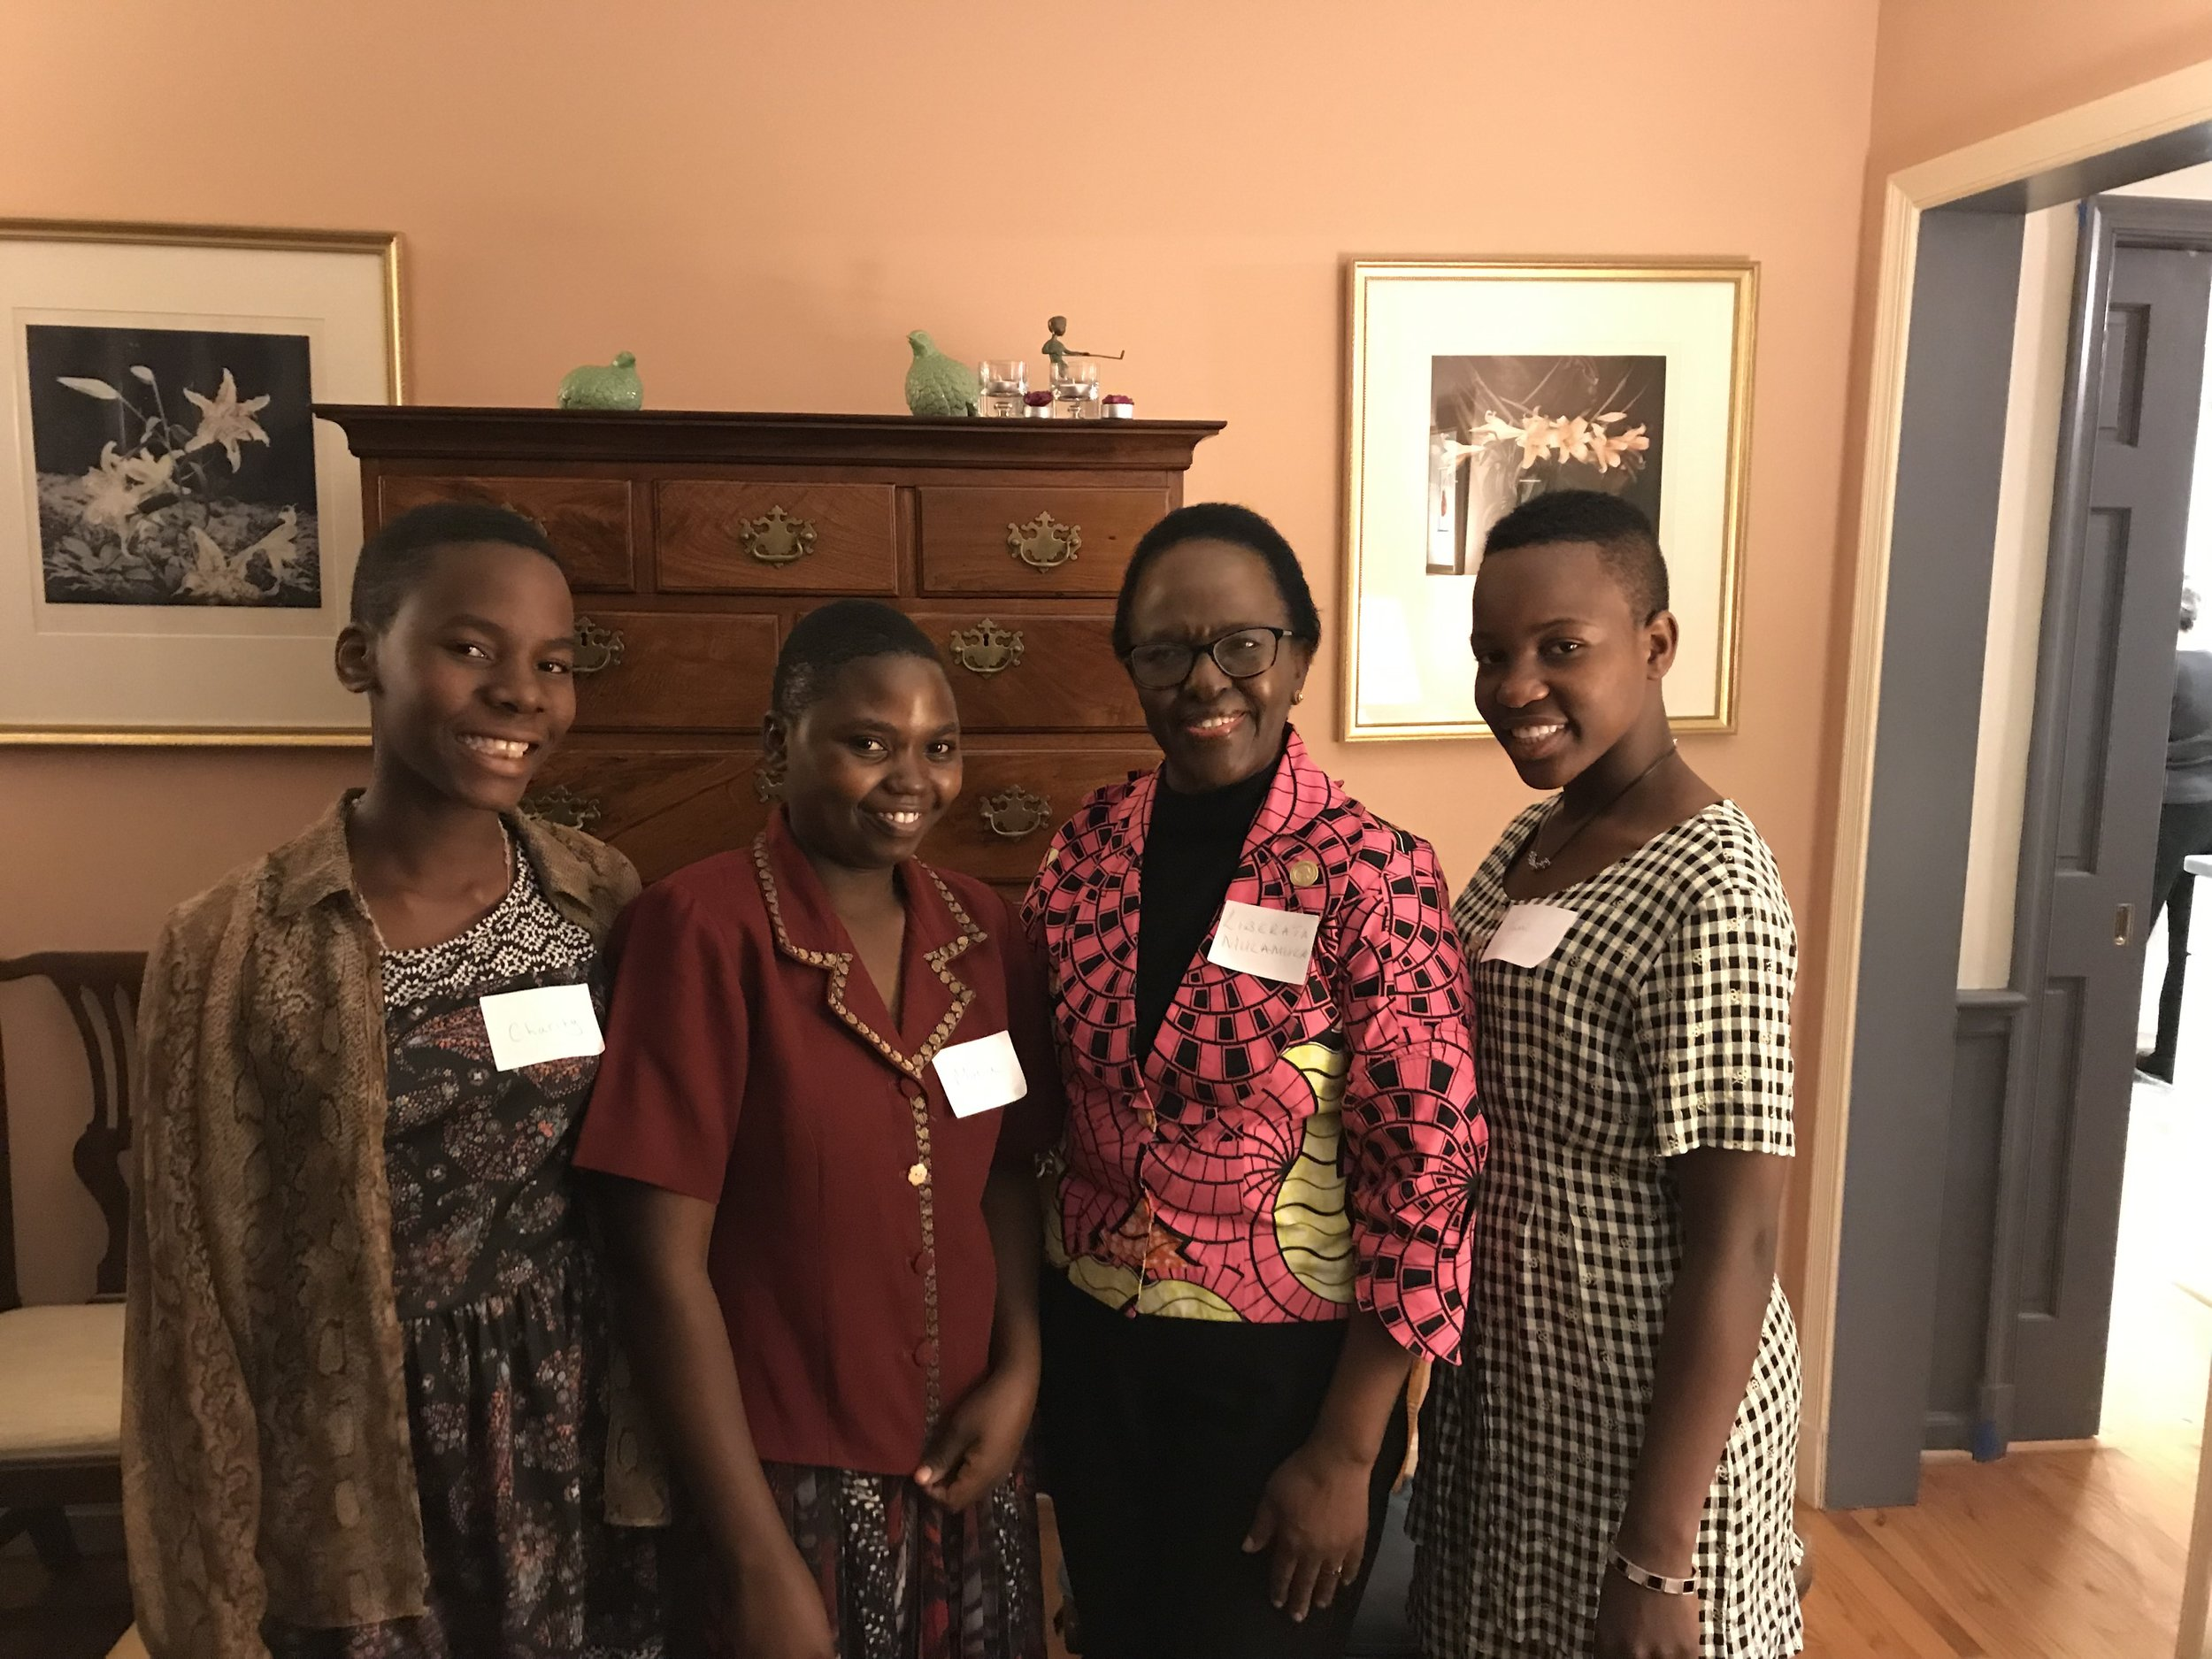 Meeting Ambassador Mulamula in Washington D.C.